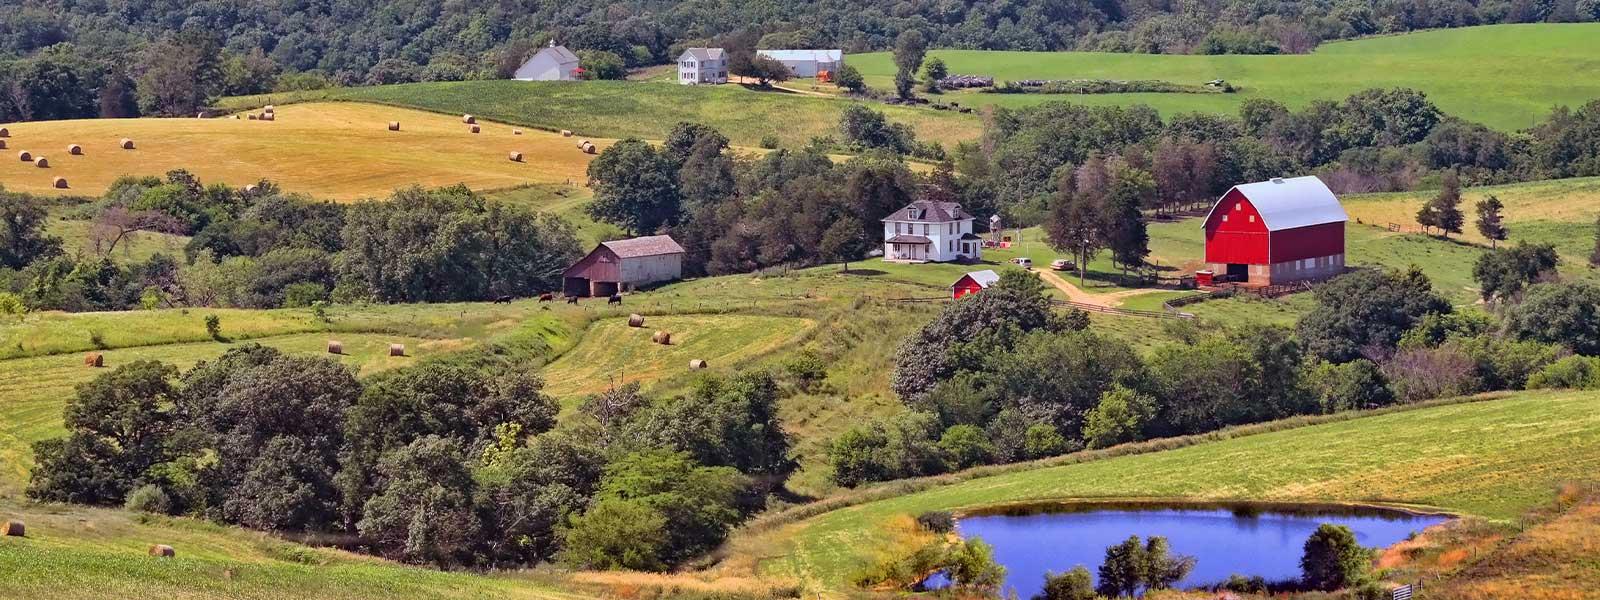 Immigrant's homes in America's heartland.